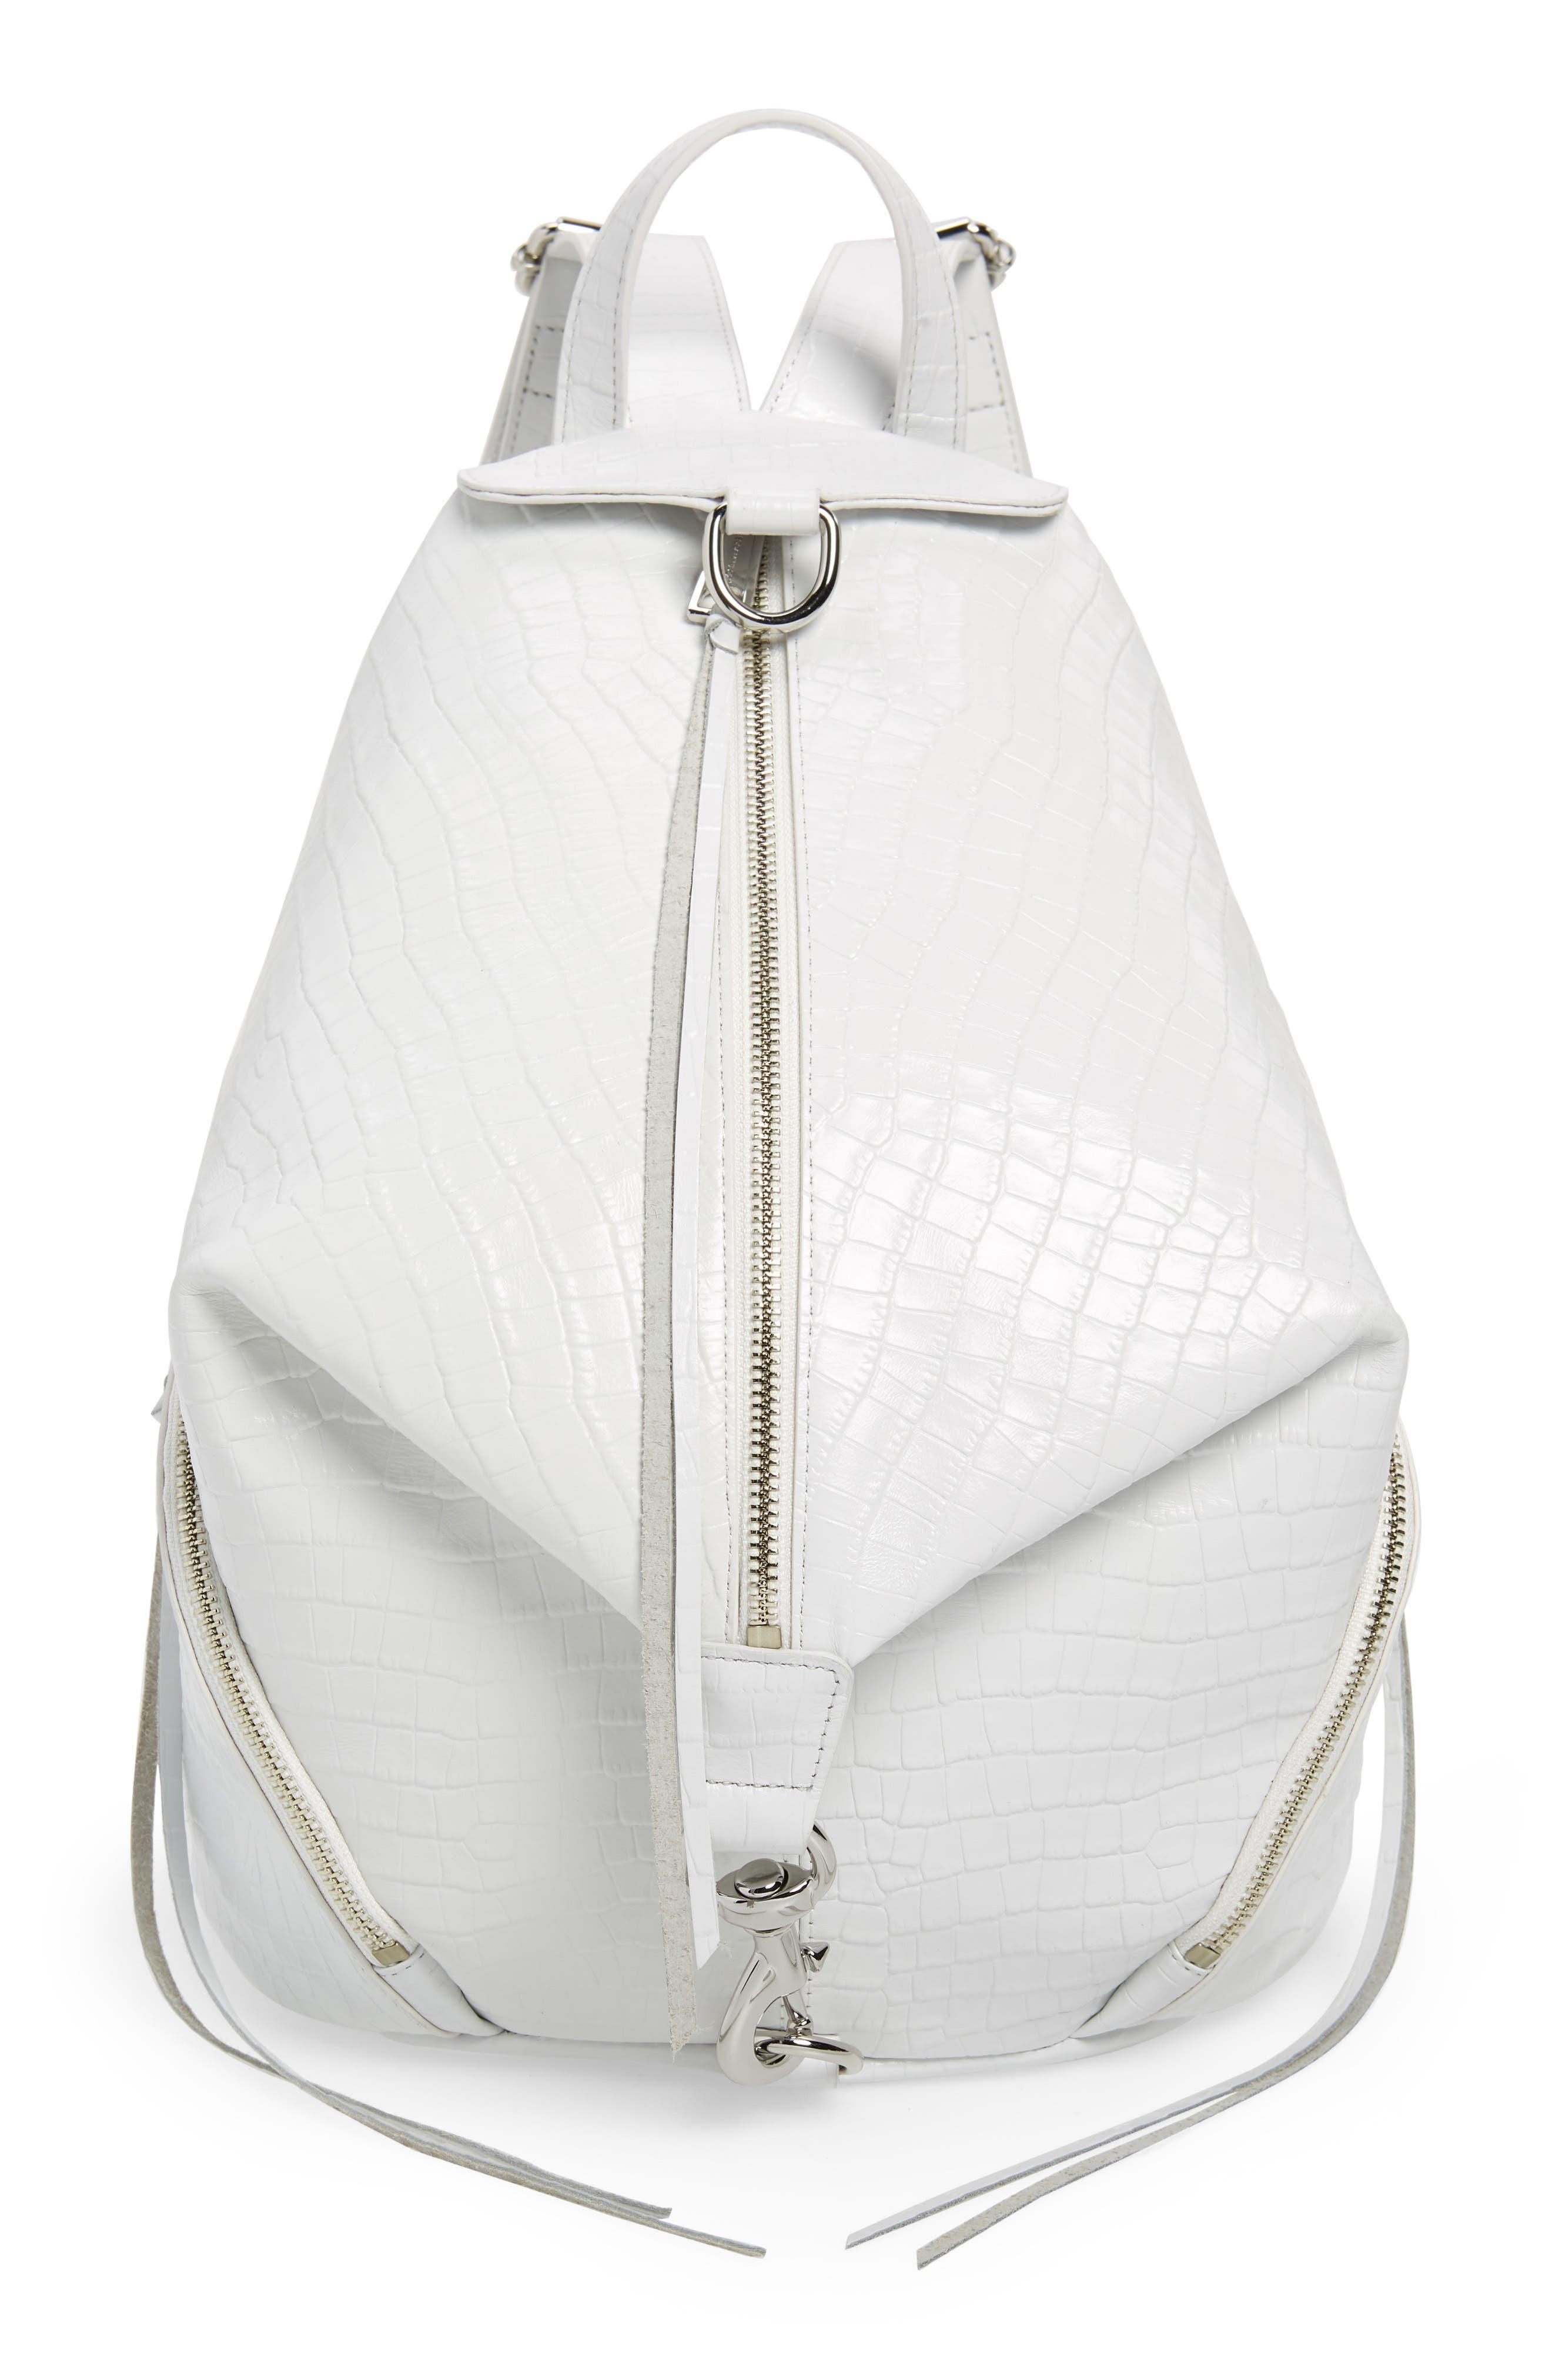 REBECCA MINKOFF Julian Croc Embossed Leather Backpack, Main, color, OPTIC WHITE